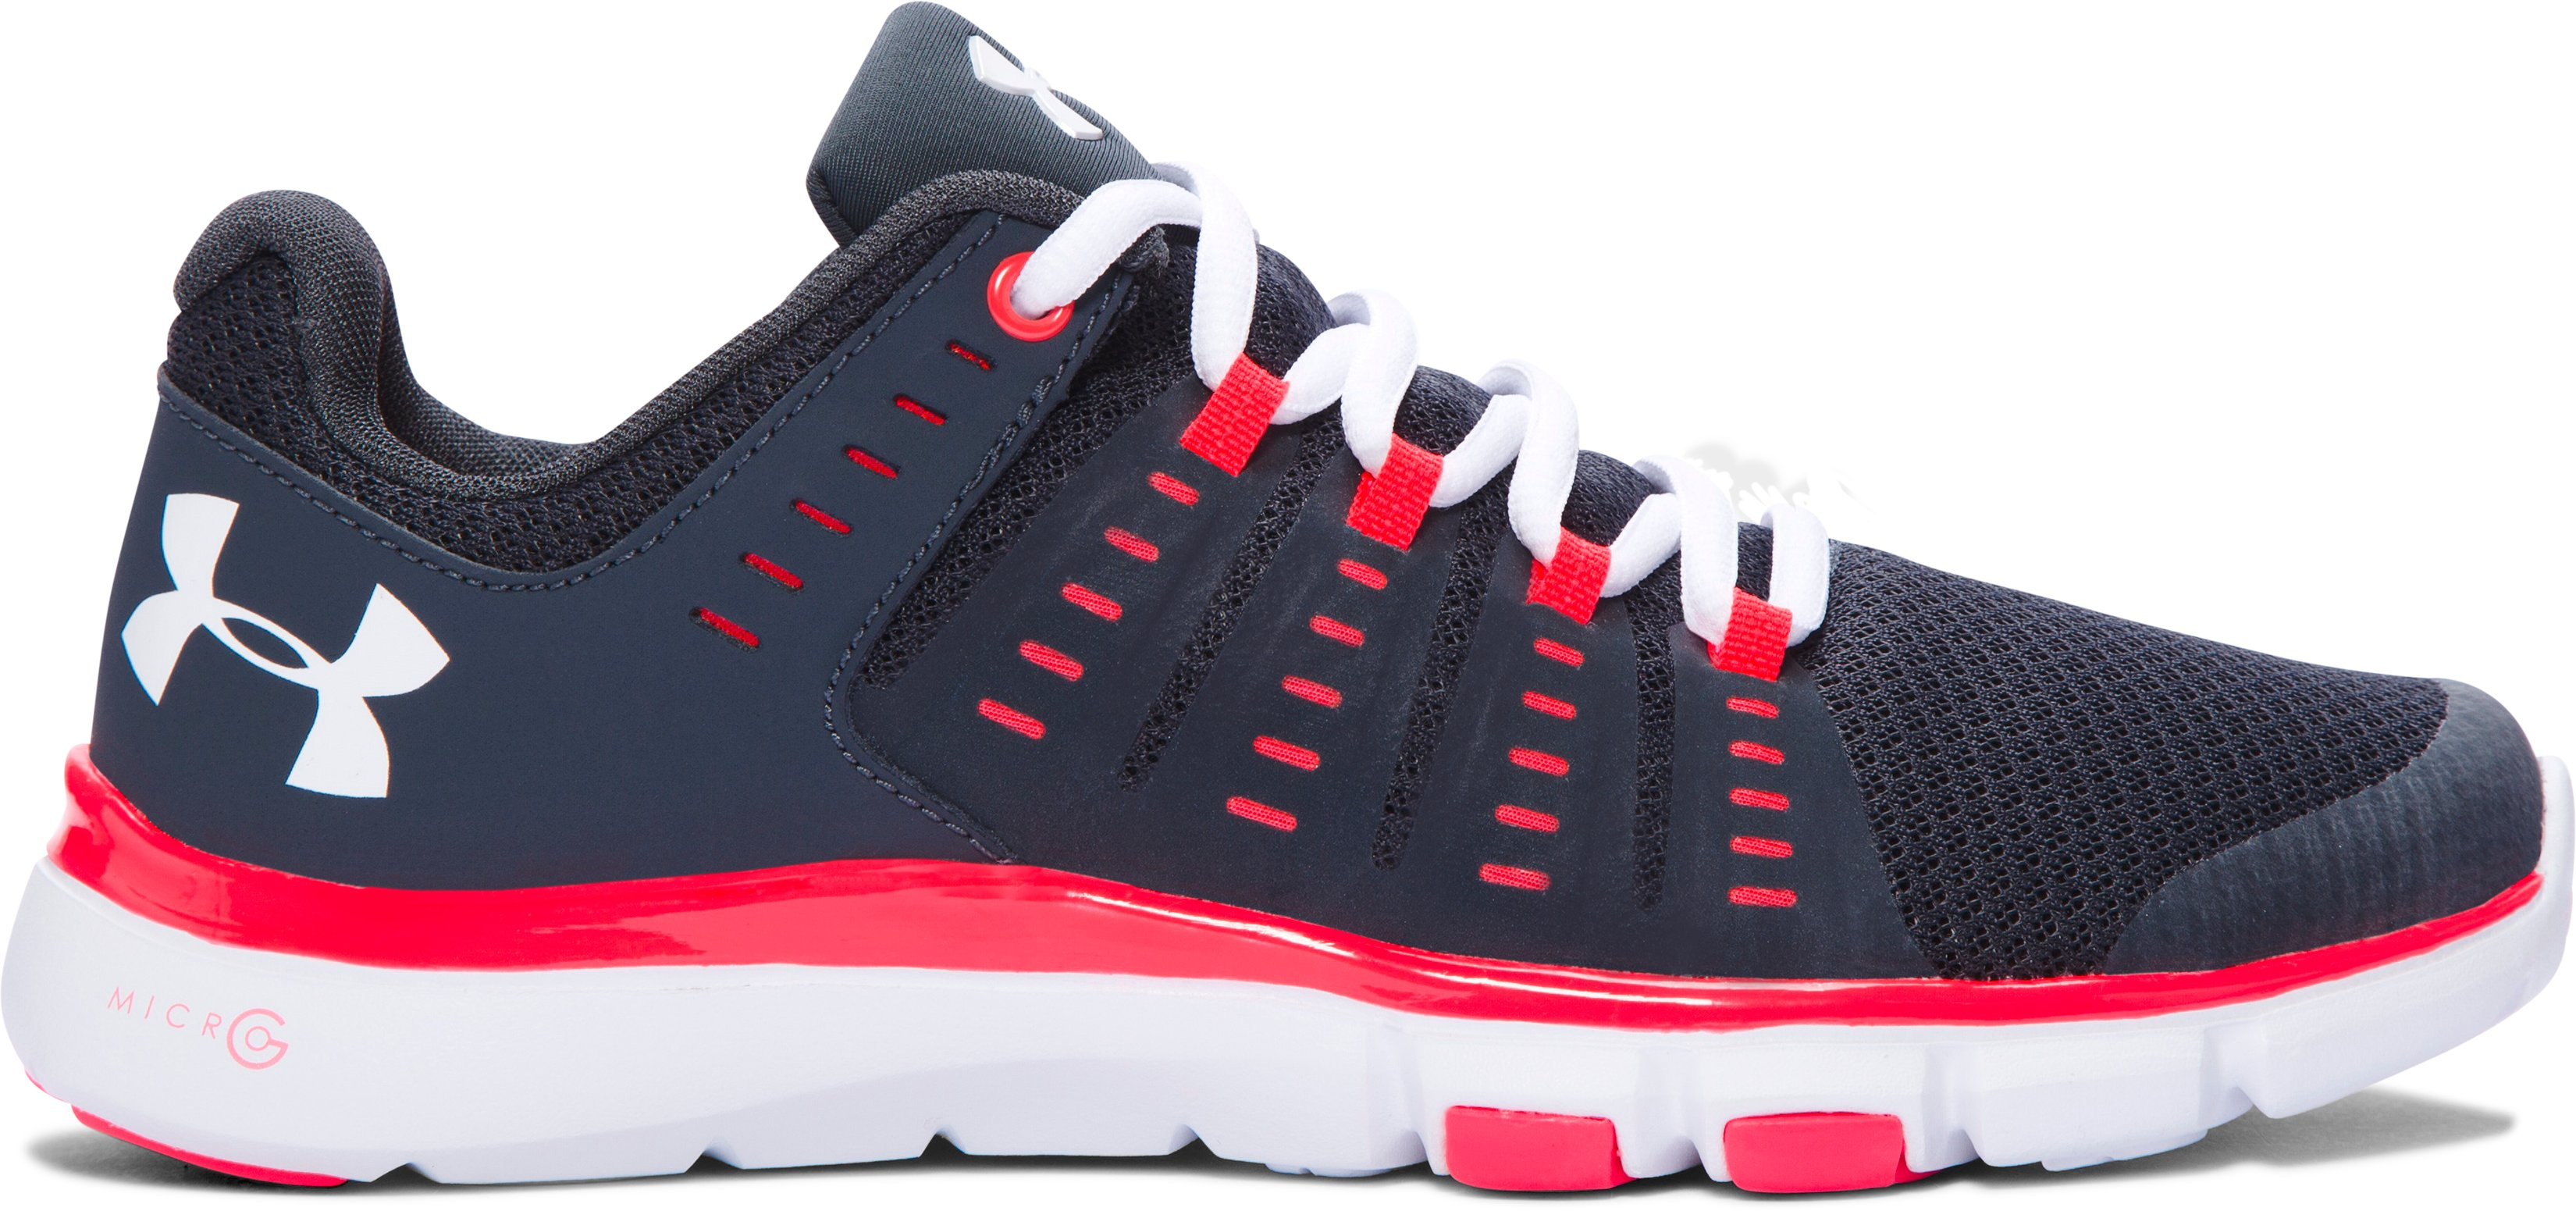 Zapatos de Training UA Micro G® Limitless 2 para Mujer, 360 degree view